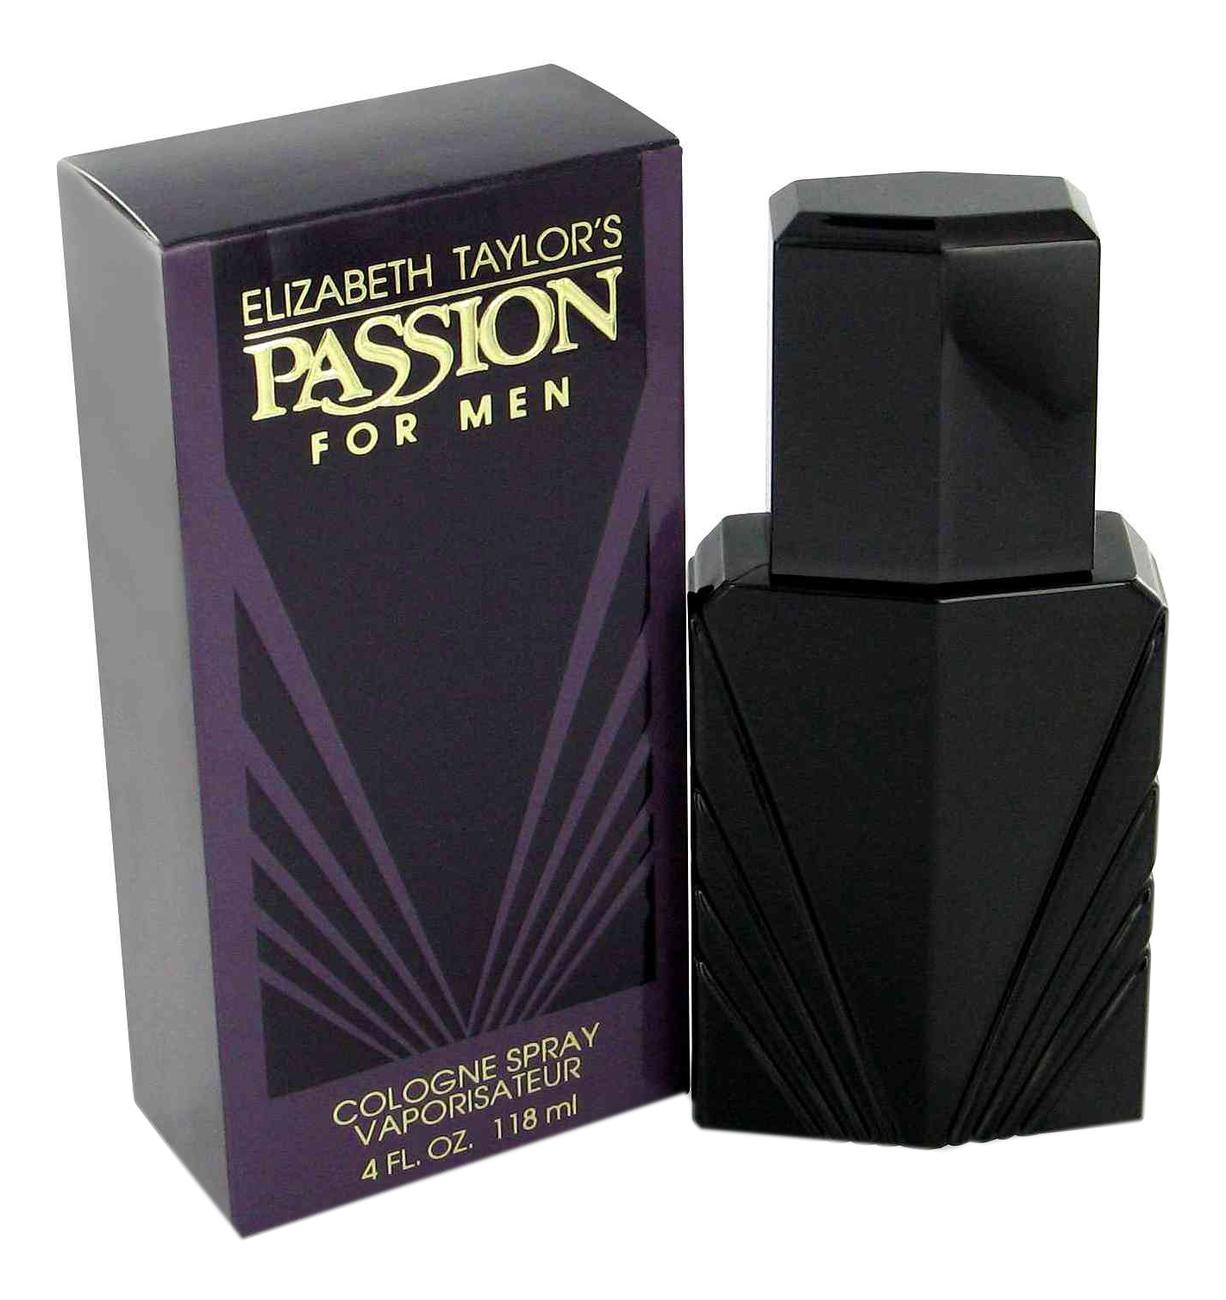 Elizabeth Taylor Passion Men: одеколон 118мл coty aspen for men одеколон 118мл